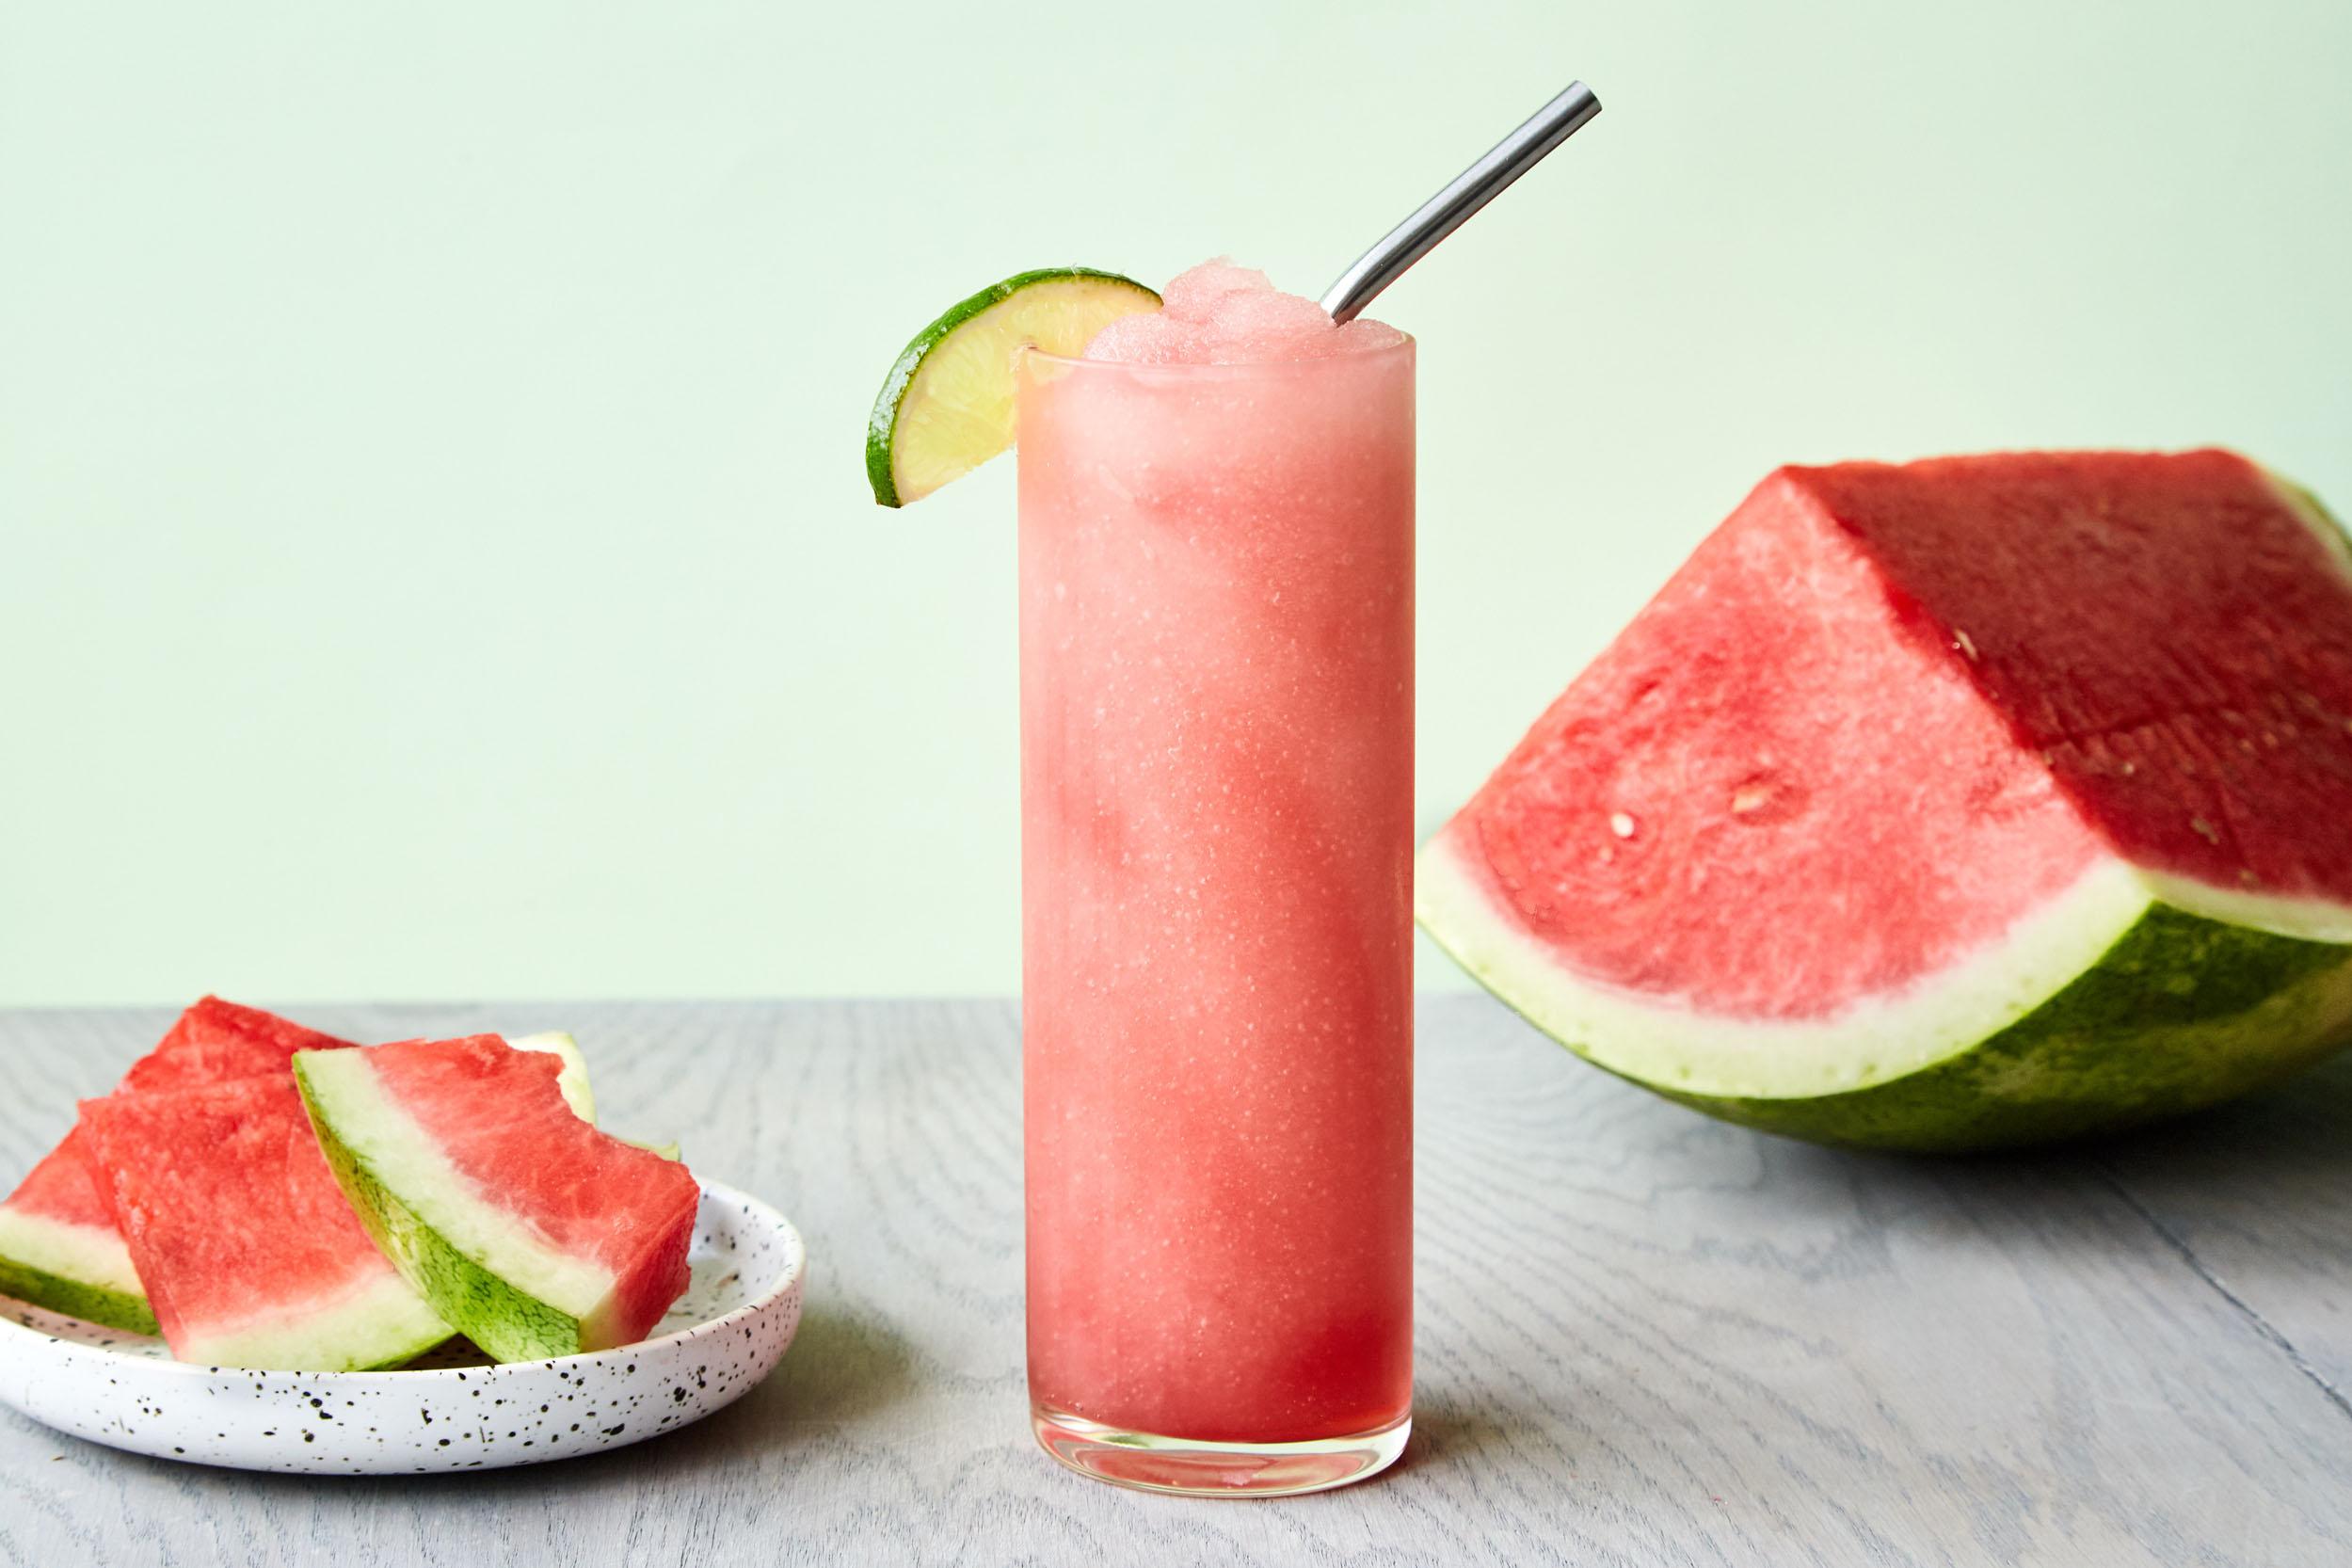 watermelon diablo - Kelvin Margarita & Ginger Slush Mix,Tequila, Watermelon Juice